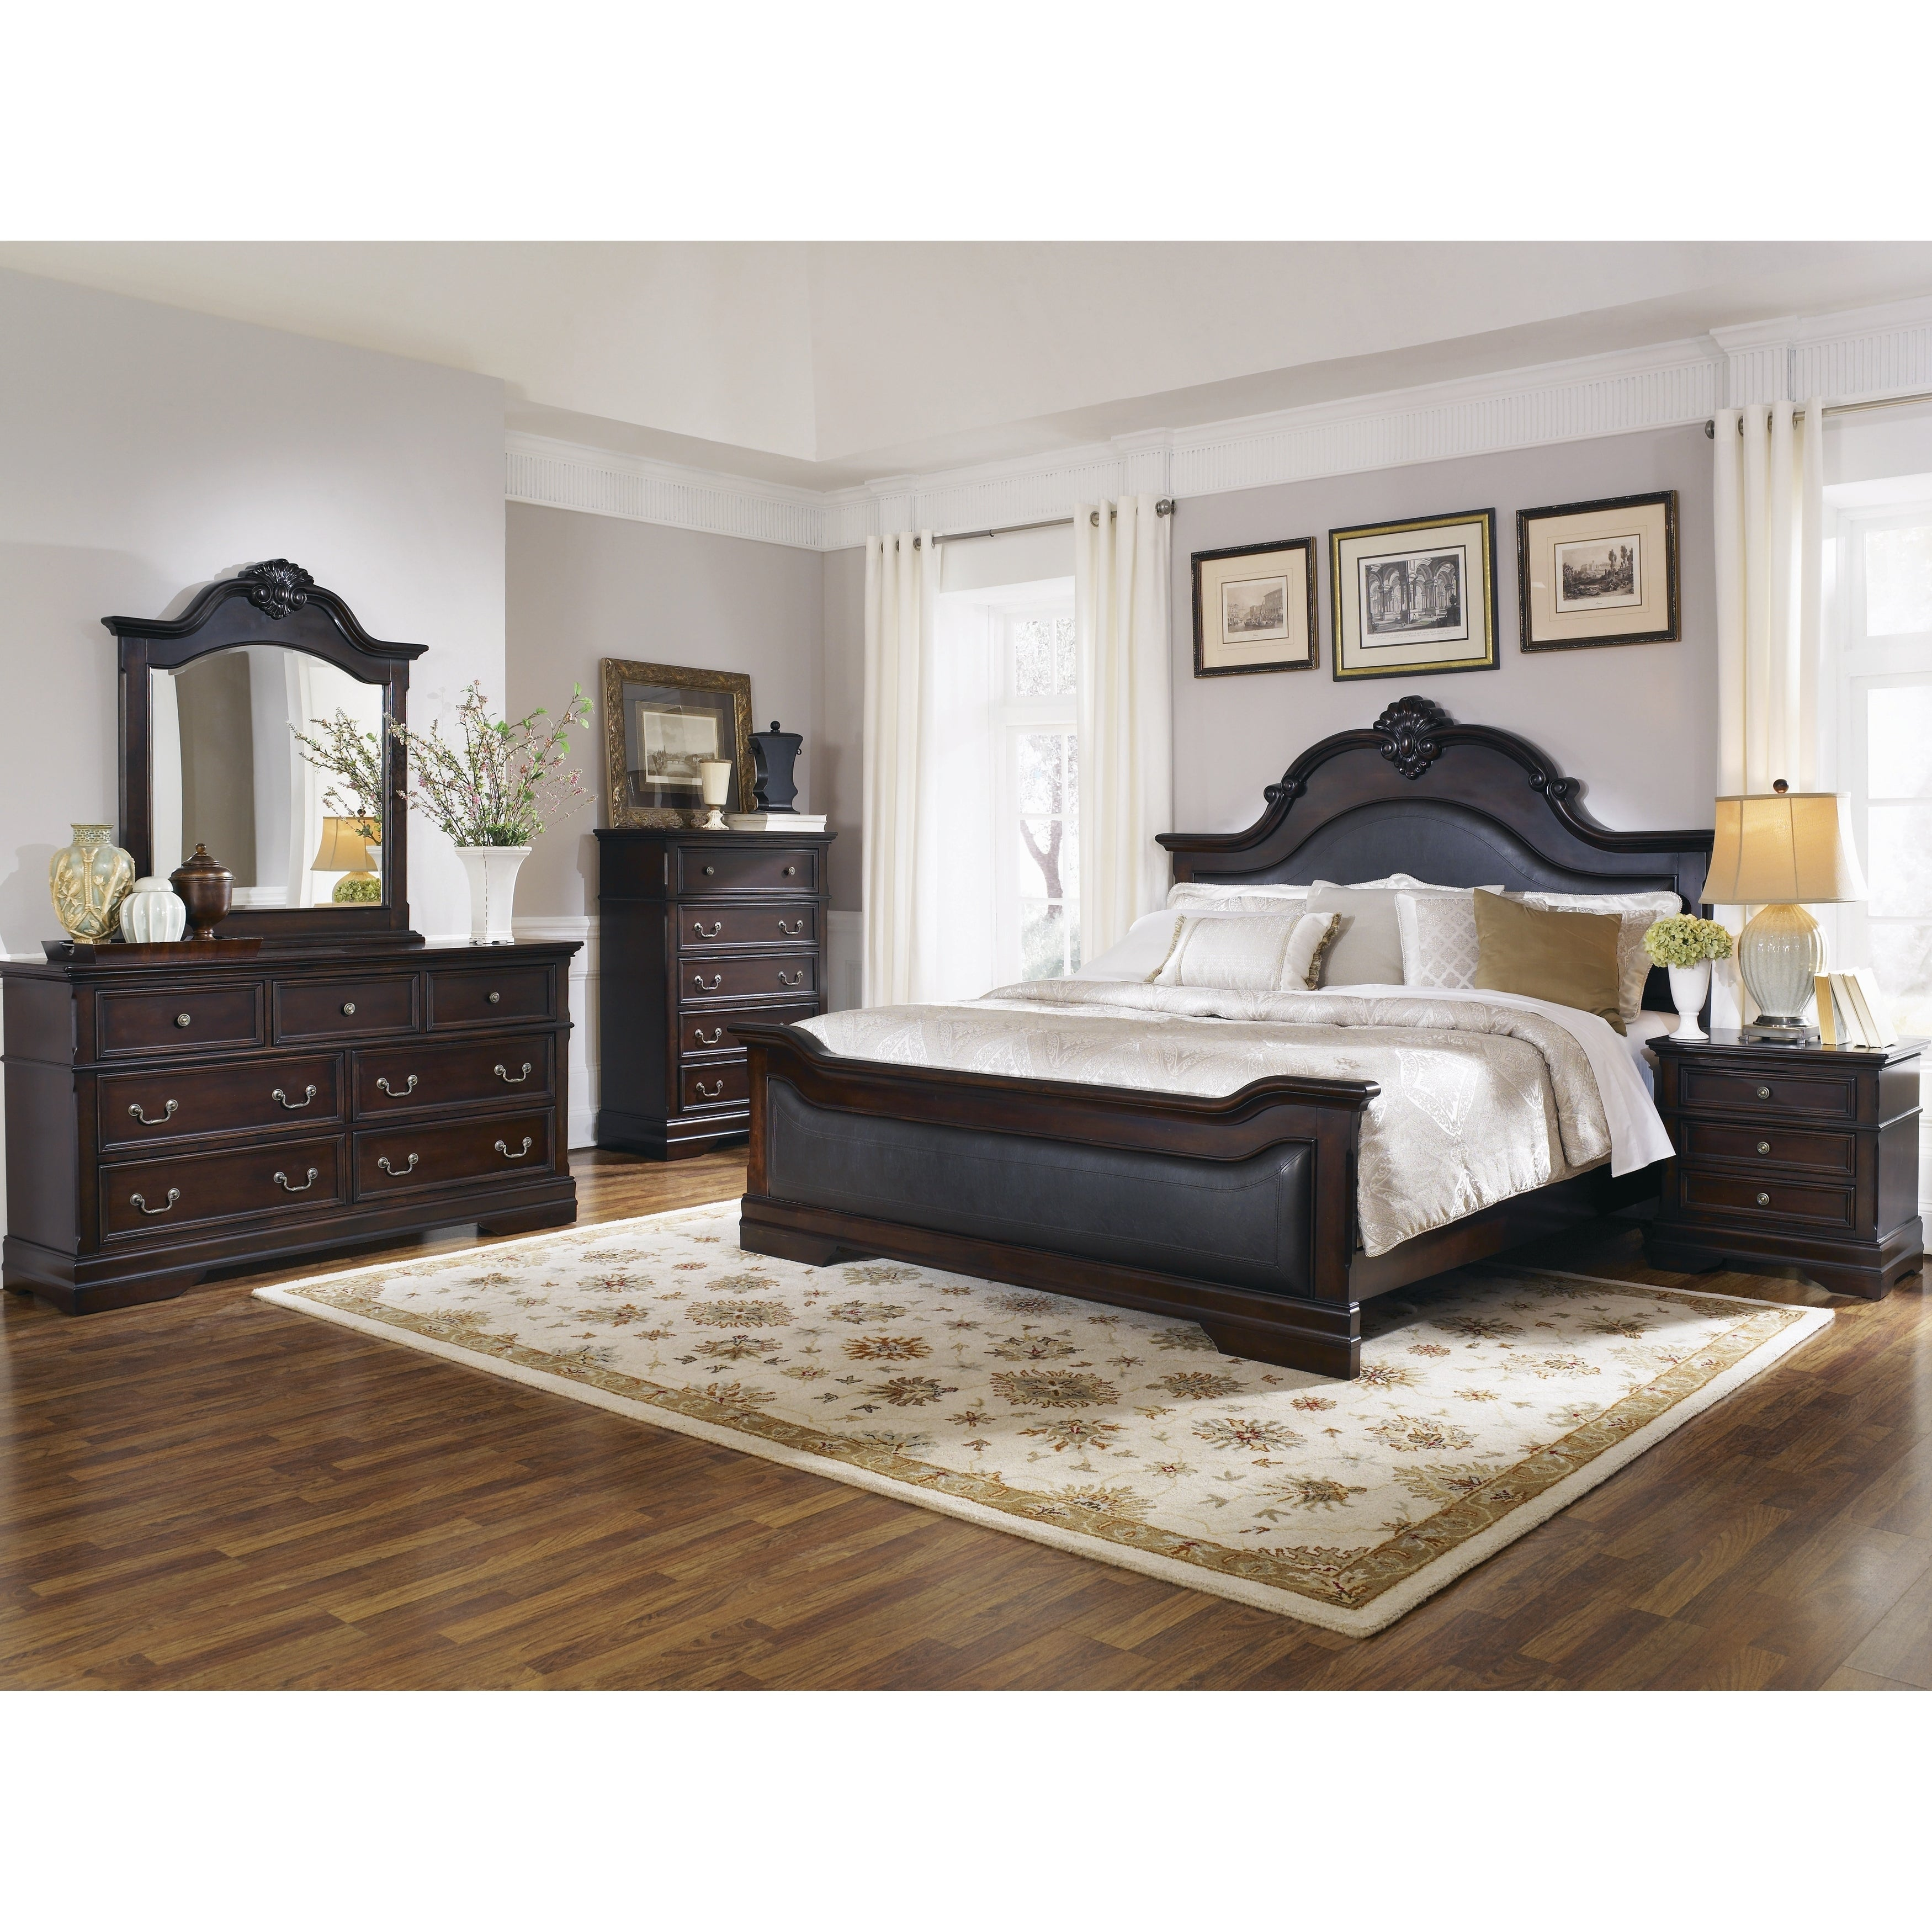 Shop Cambridge Traditional Dark Brown 4-piece Bedroom Set - On Sale ...